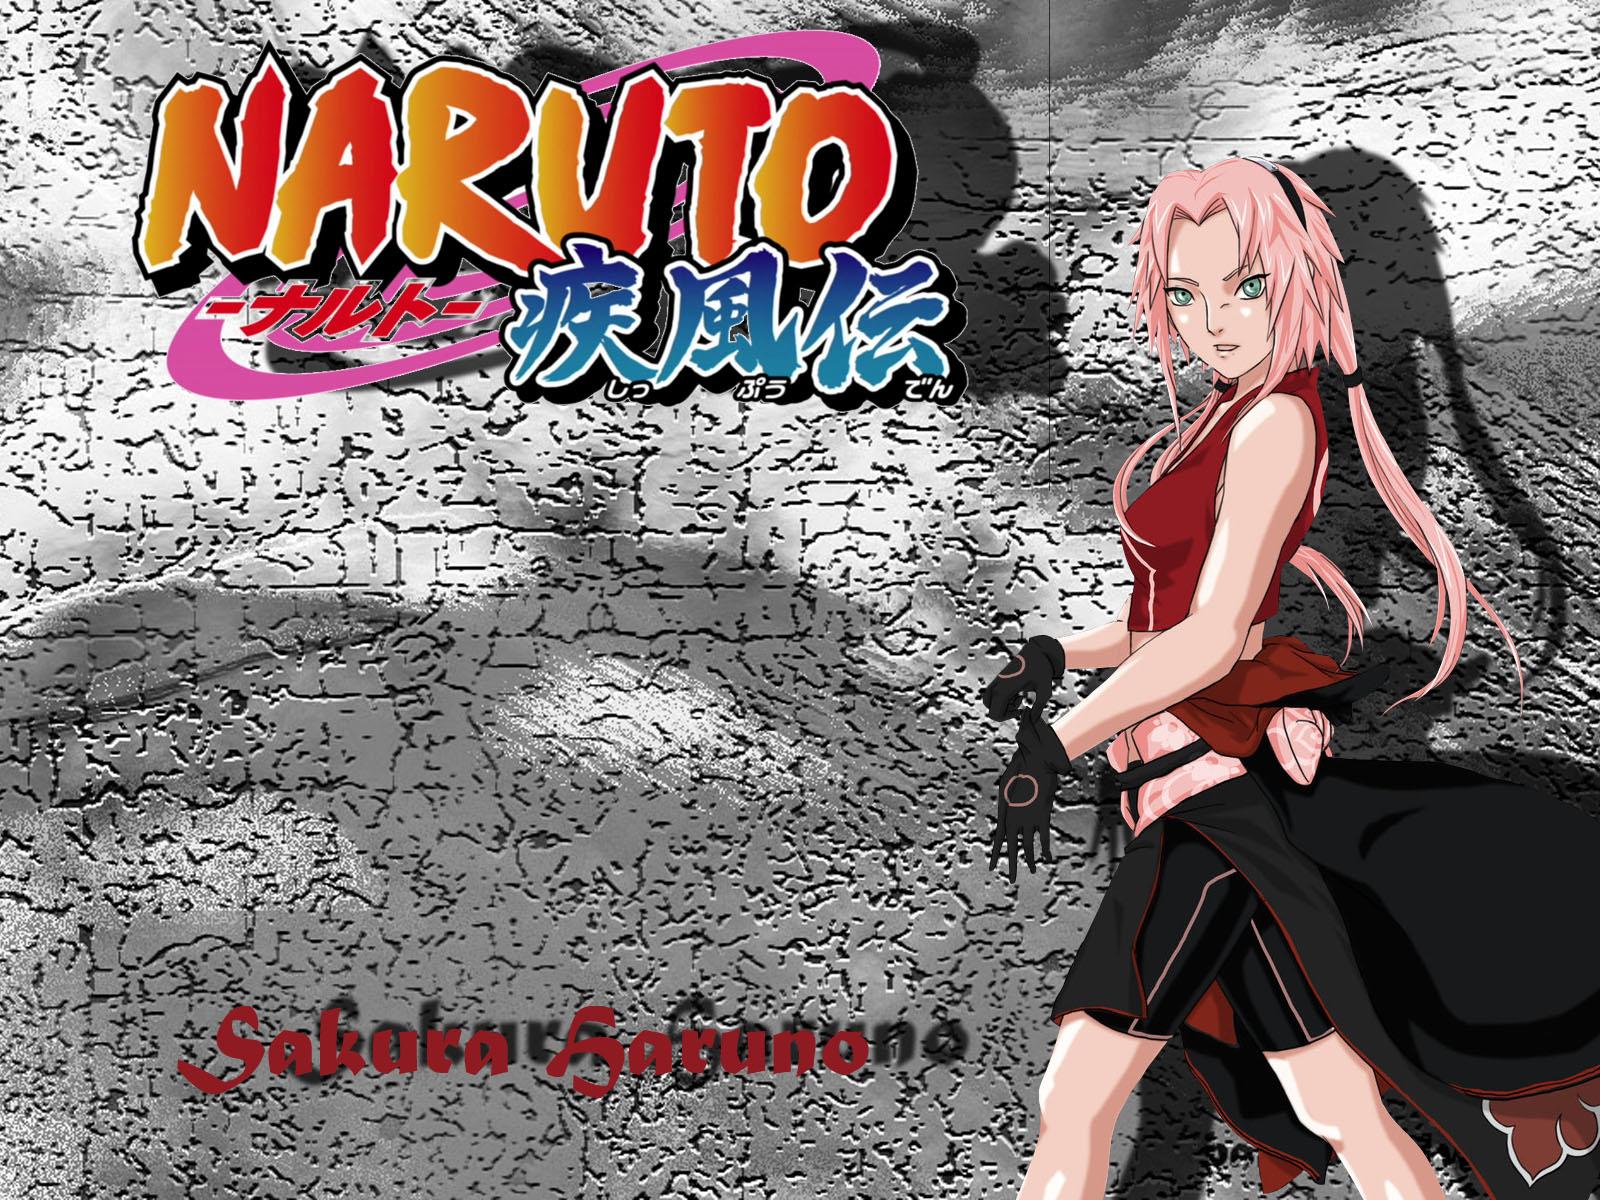 Download wallpaper sakura haruno wallpaper for desktop - Sakura desktop ...